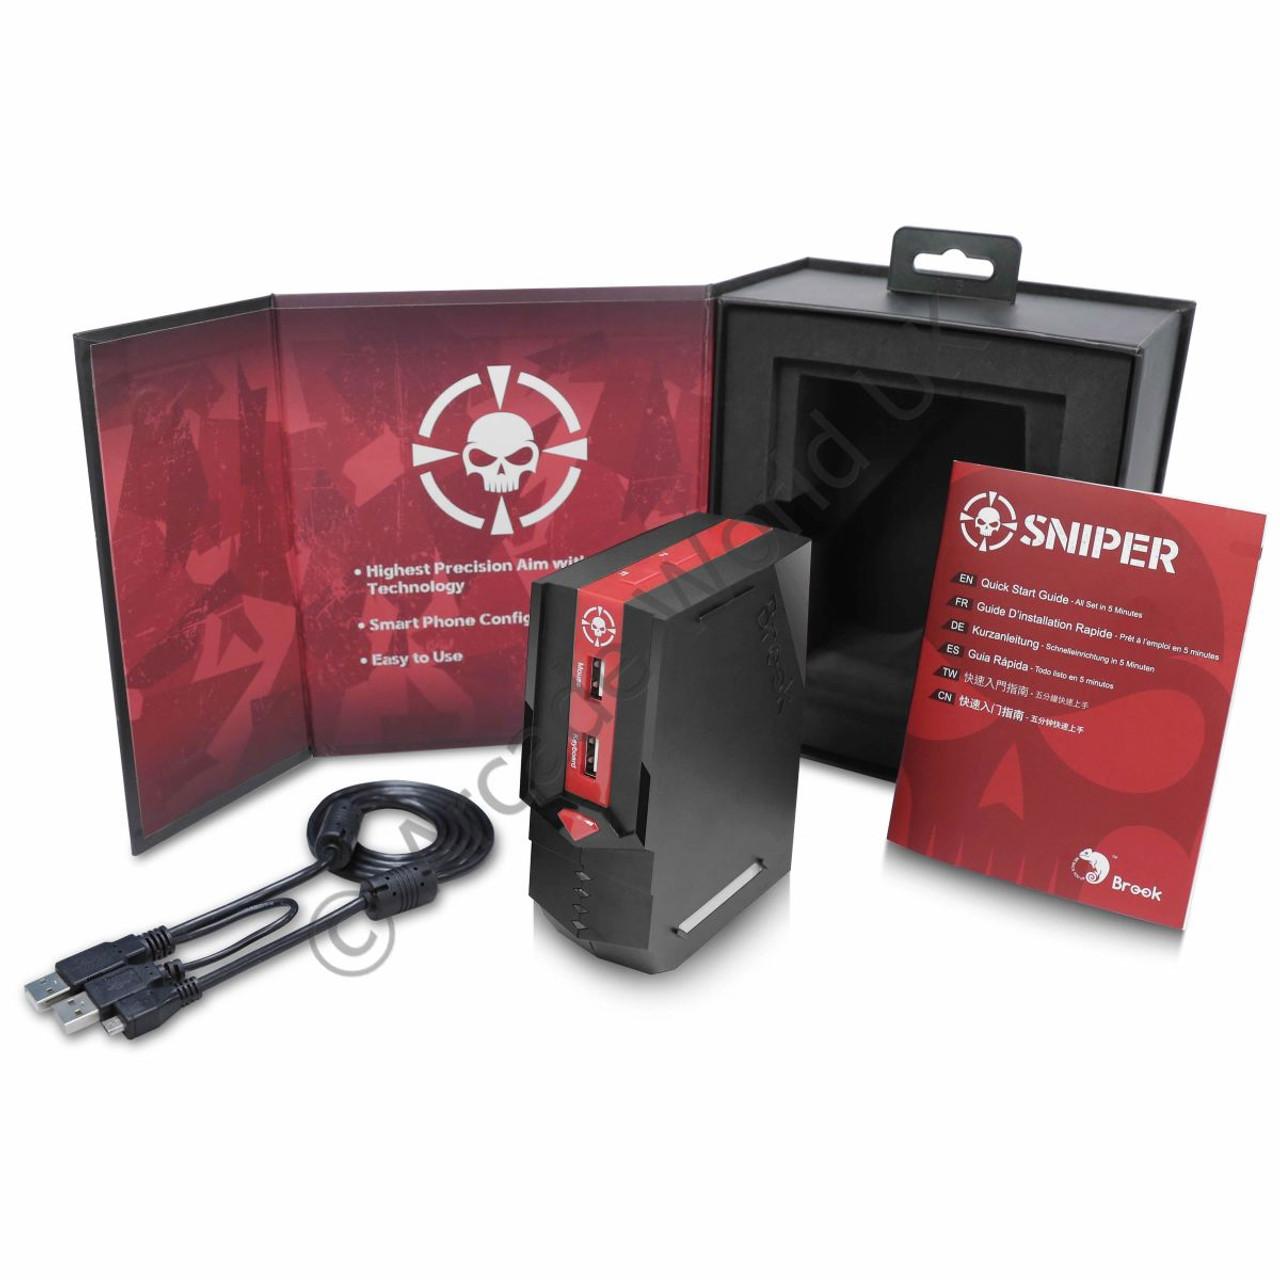 Brook Sniper Fps Keyboard Mouse Converter Arcade World Uk Pcb Circuit Board Buy Bluetooth